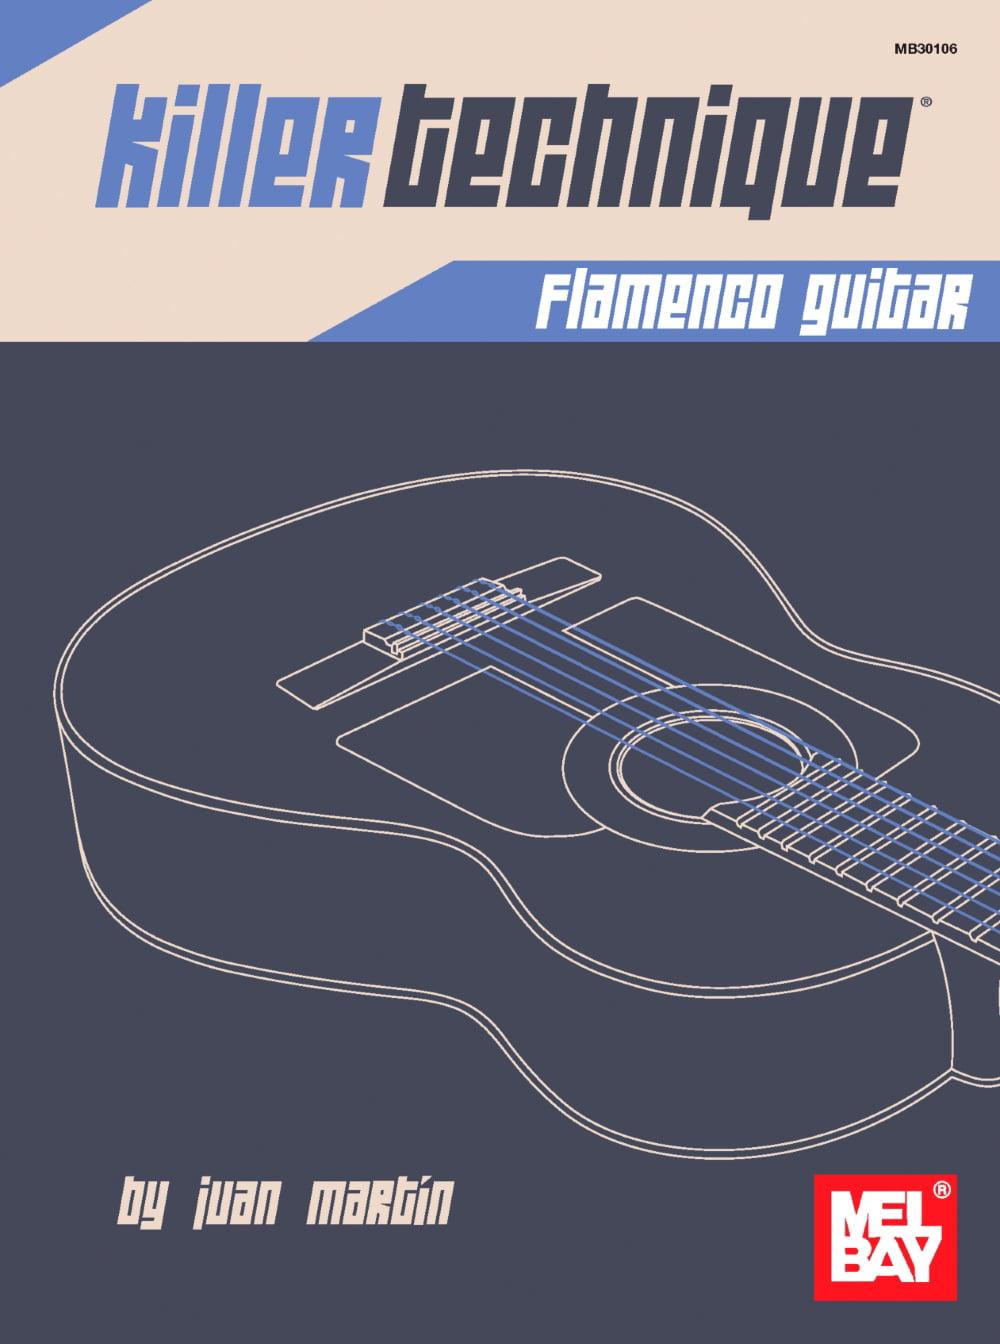 Mel Bay Killer Technique: Flamenco Guitar by